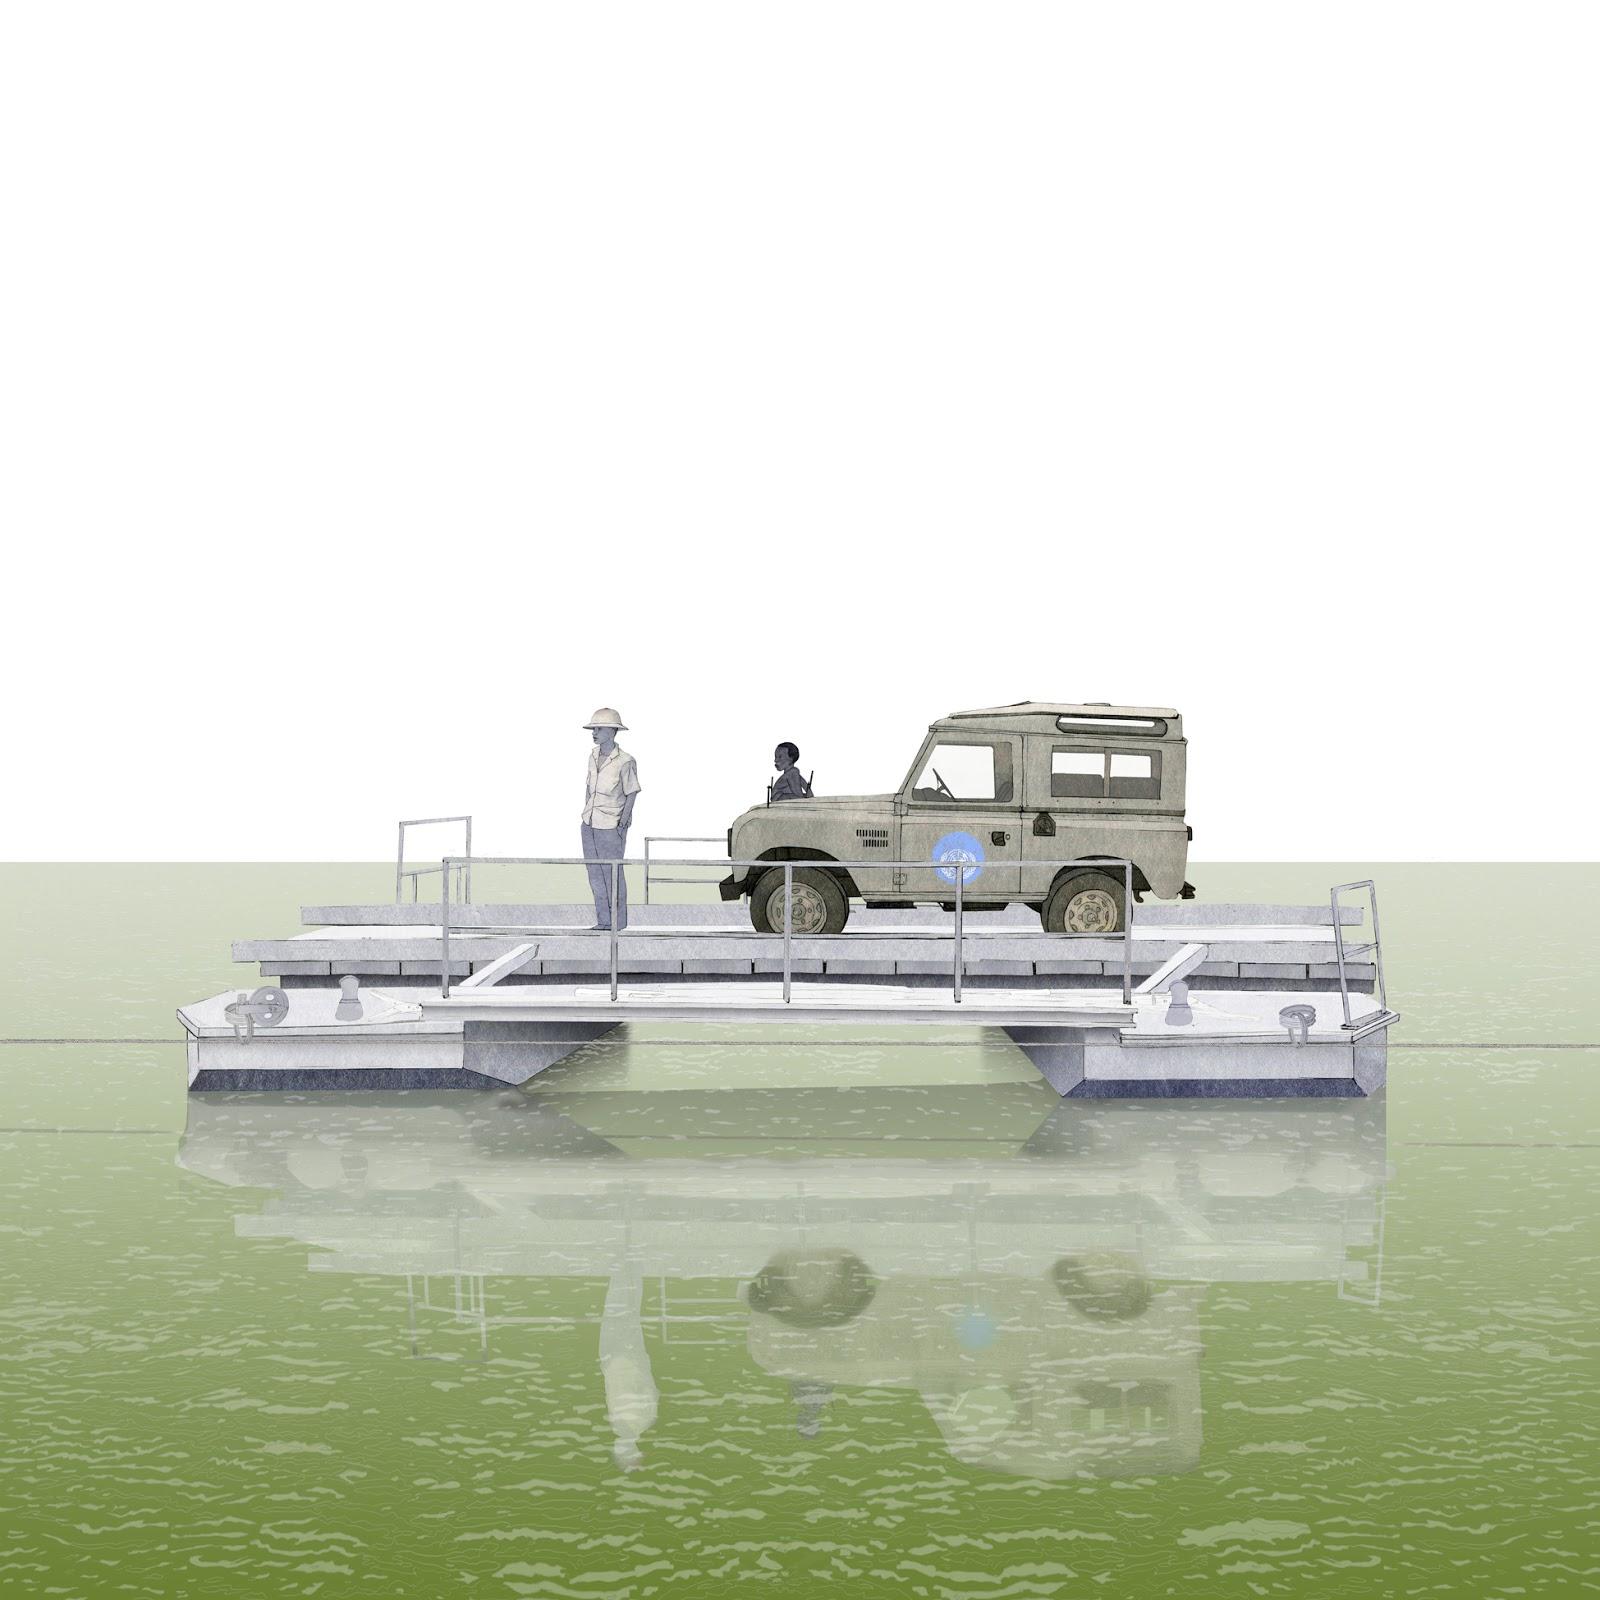 puente flotante, barcaza, Carsi , Land Rover, dibujo,